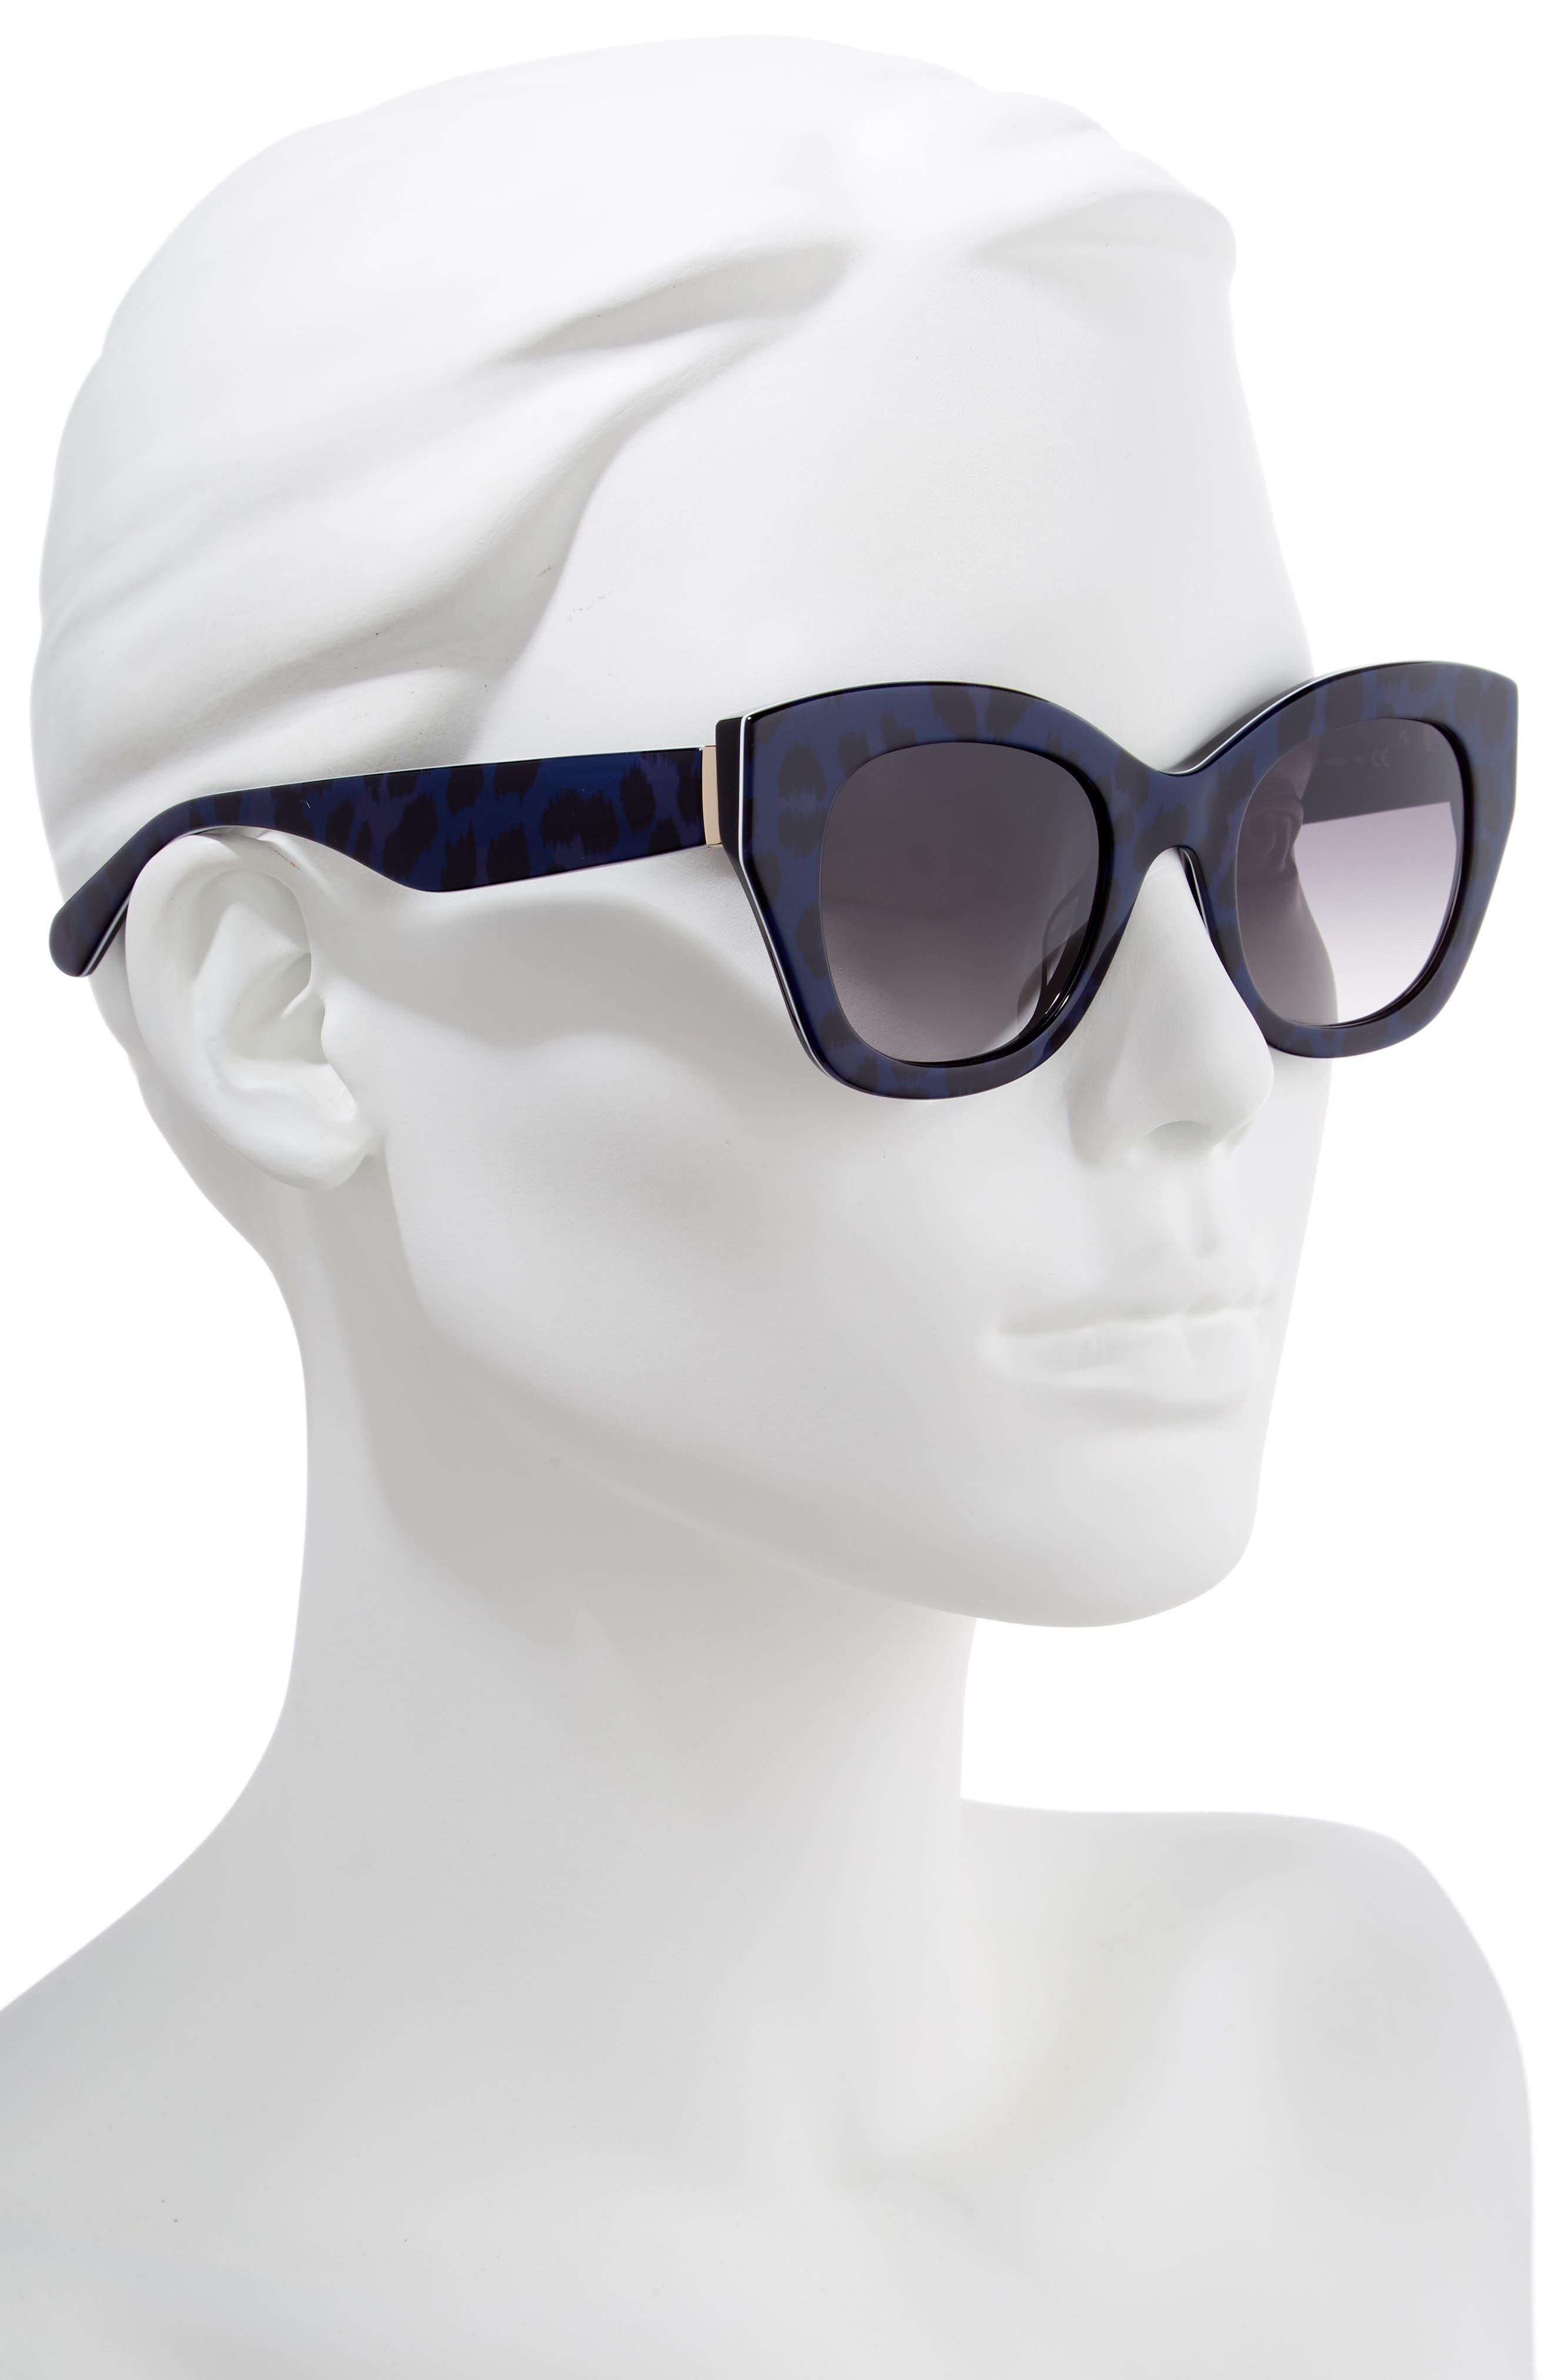 jalena 49mm gradient sunglasses,                             Alternate thumbnail 2, color,                             BLACK PATTERN BLACK